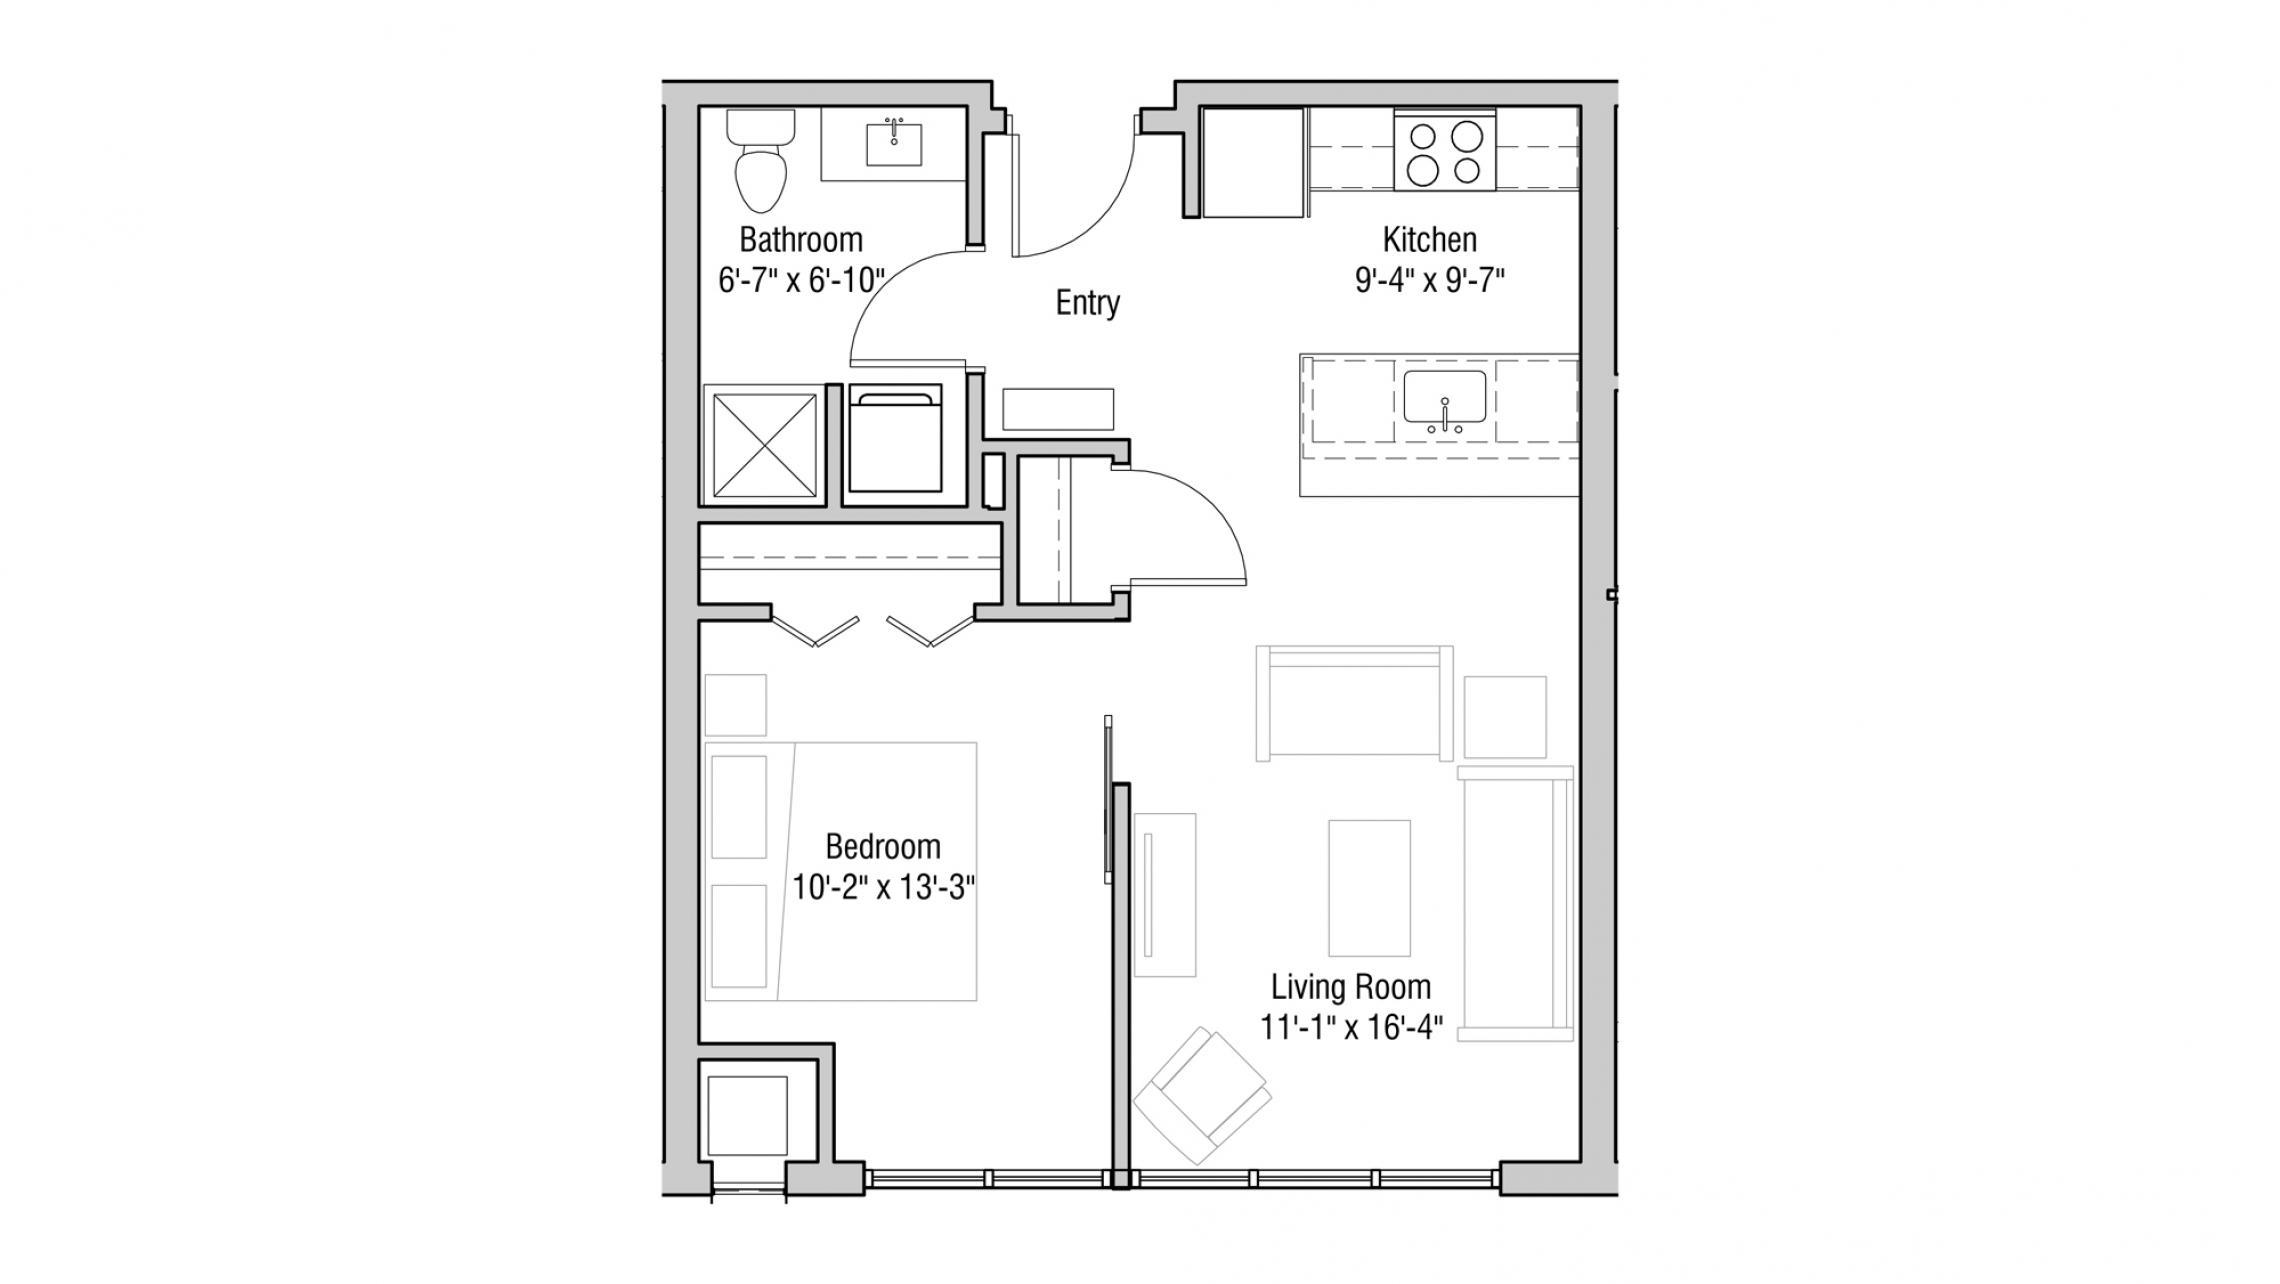 ULI Quarter Row 307 - One Bedroom, One Bathroom